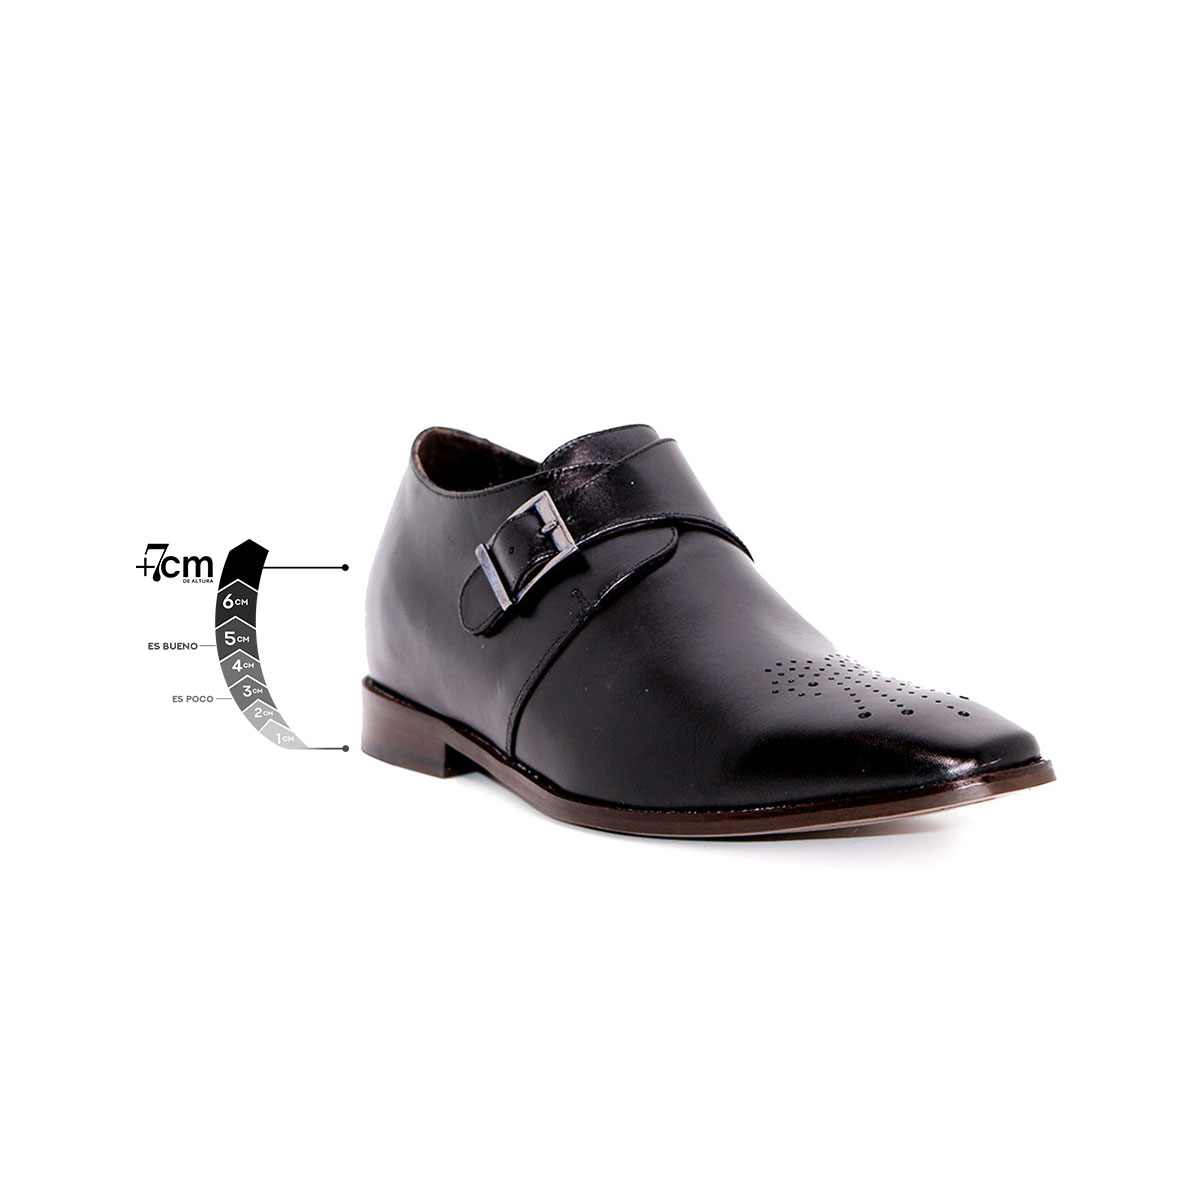 Zapato Formal Gentleman Negro Max Denegri +7cms De Altura_76299